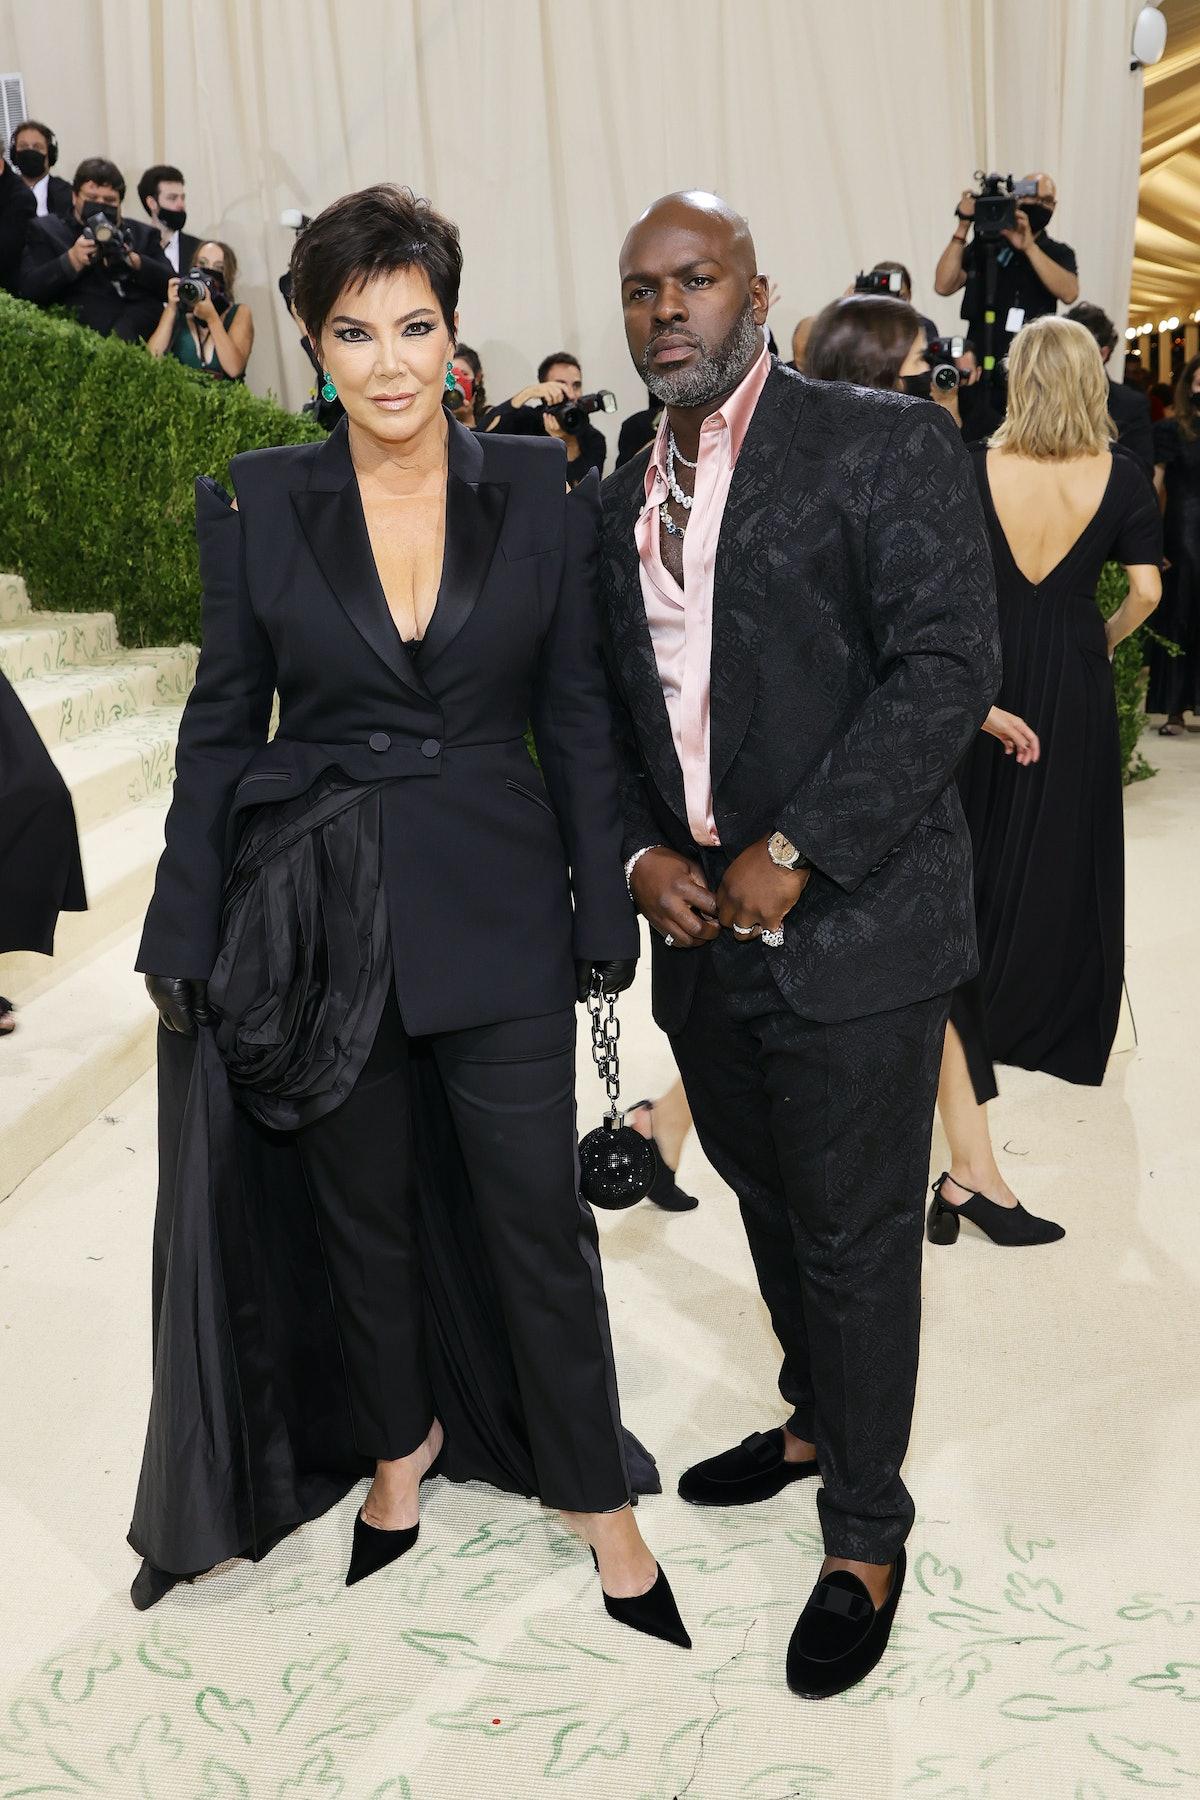 Kris Jenner and Corey Gamble attend The 2021 Met Gala